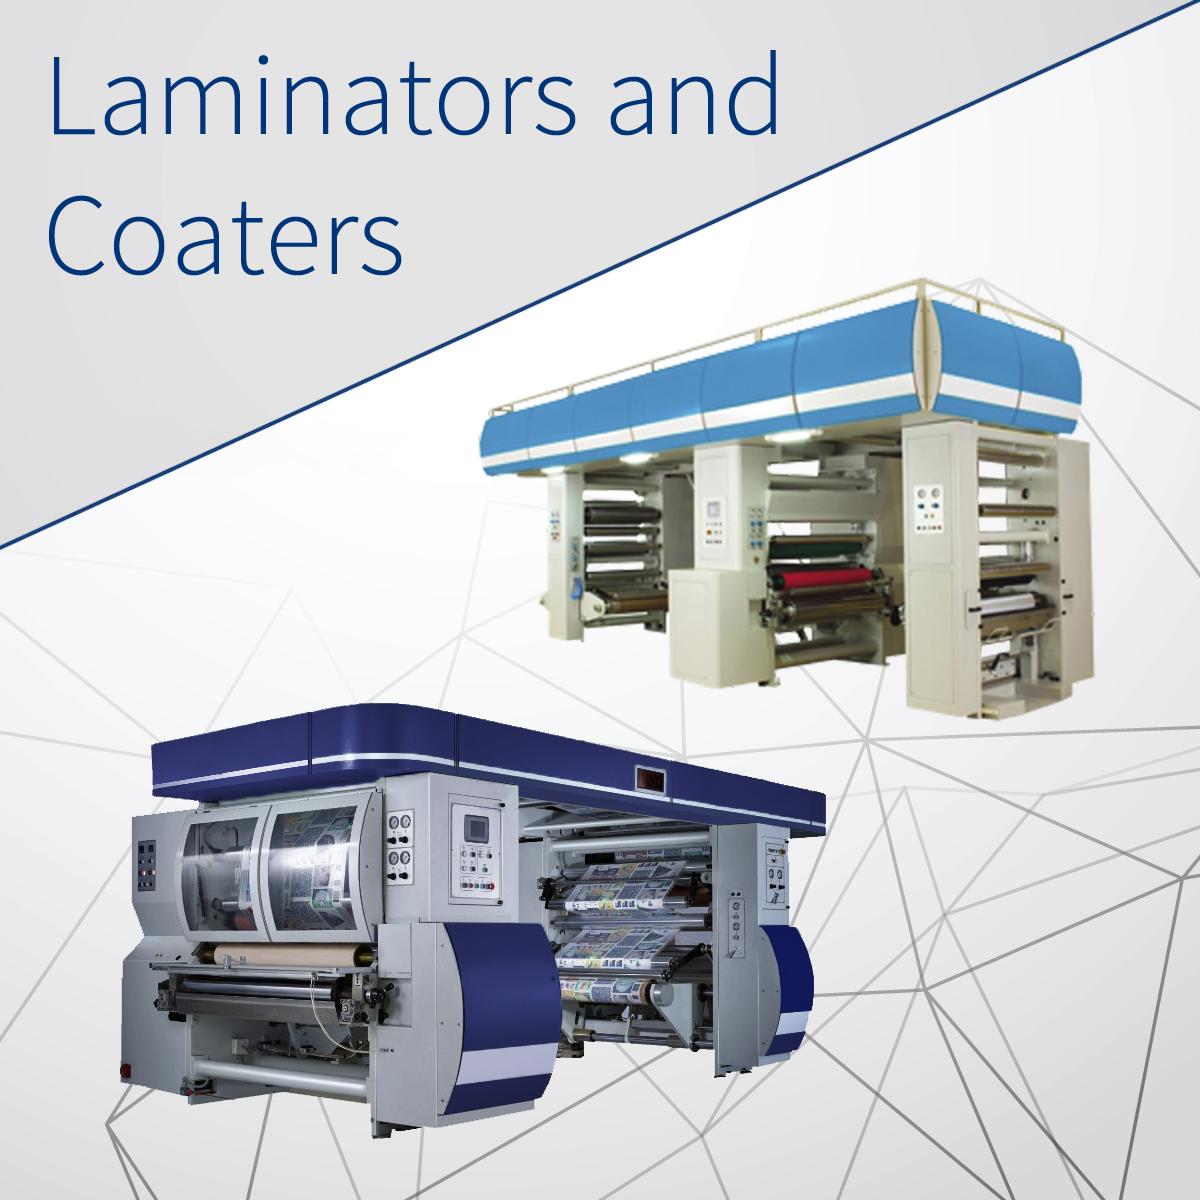 Laminators and Coaters 2.jpg